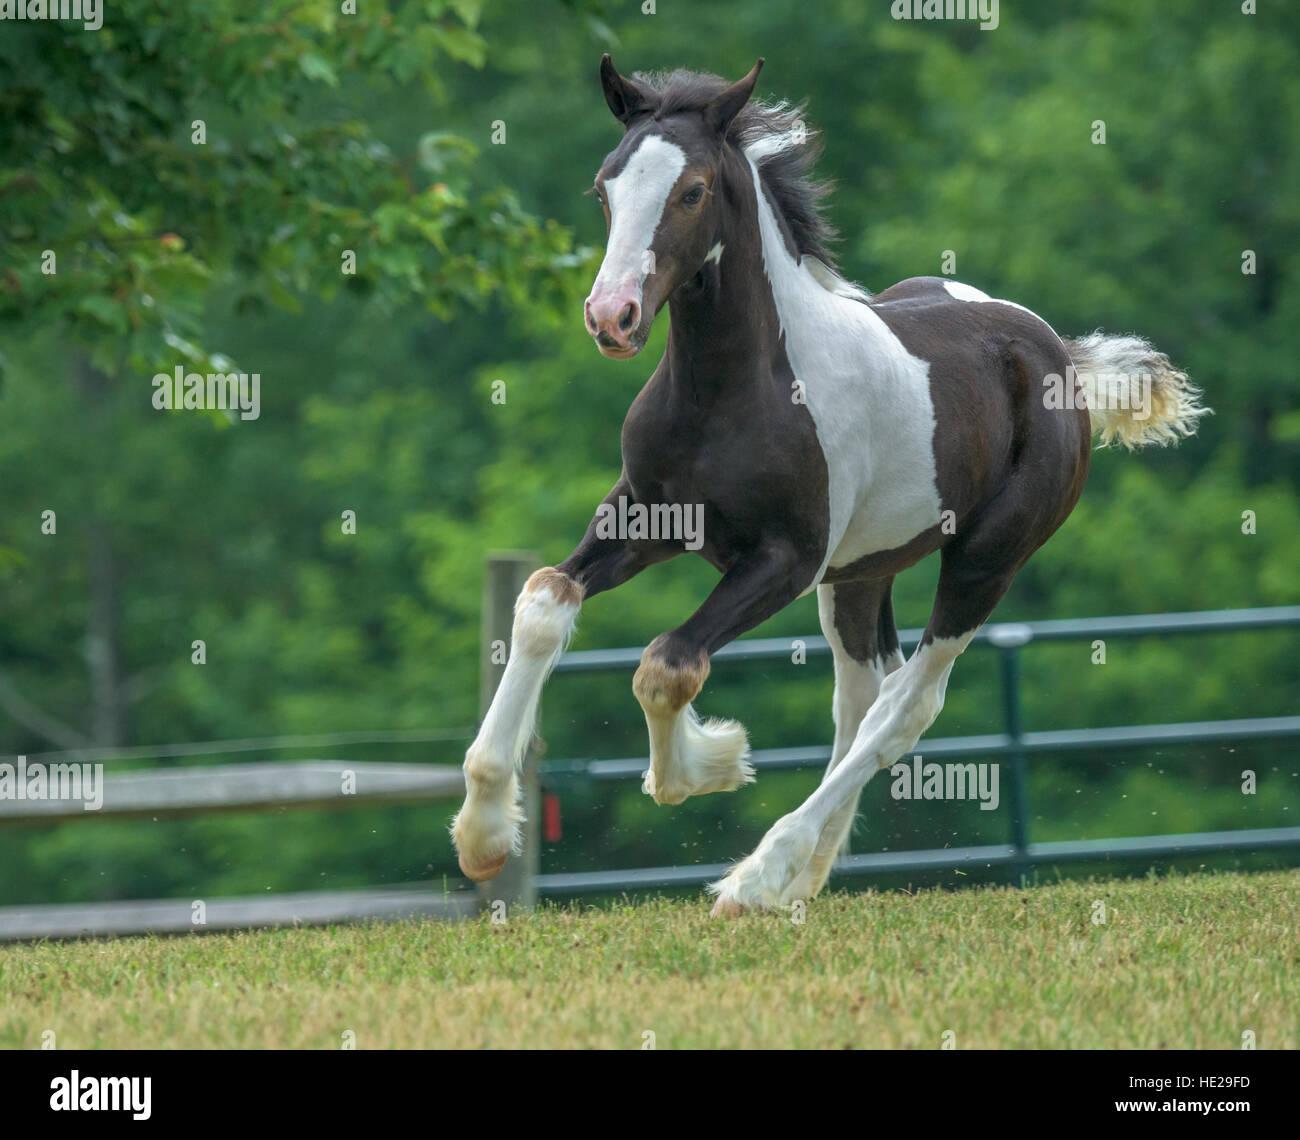 Gypsy Vanner horse weanling foal - Stock Image